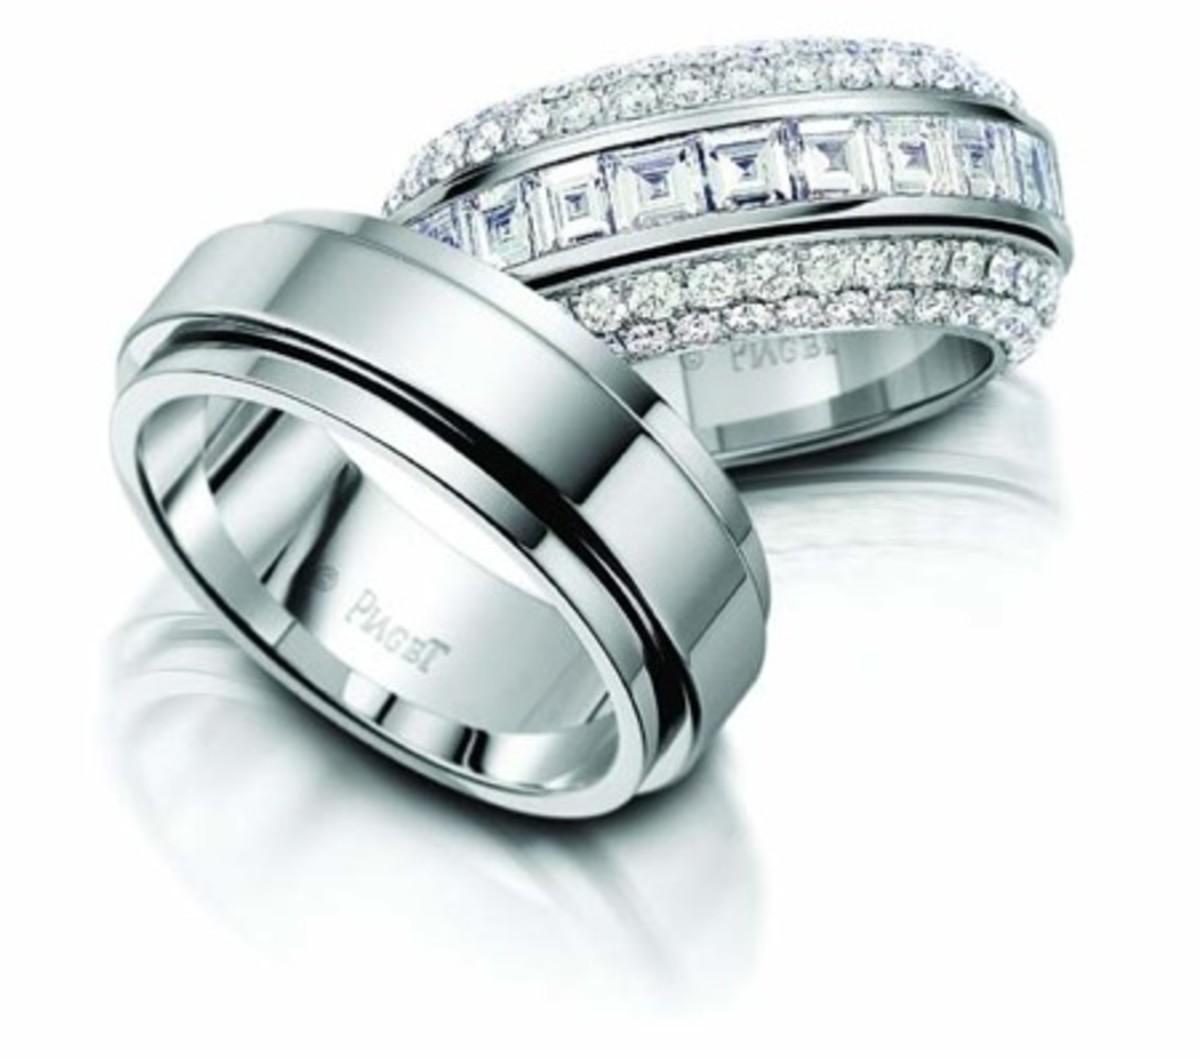 Triple banded French bridal design.